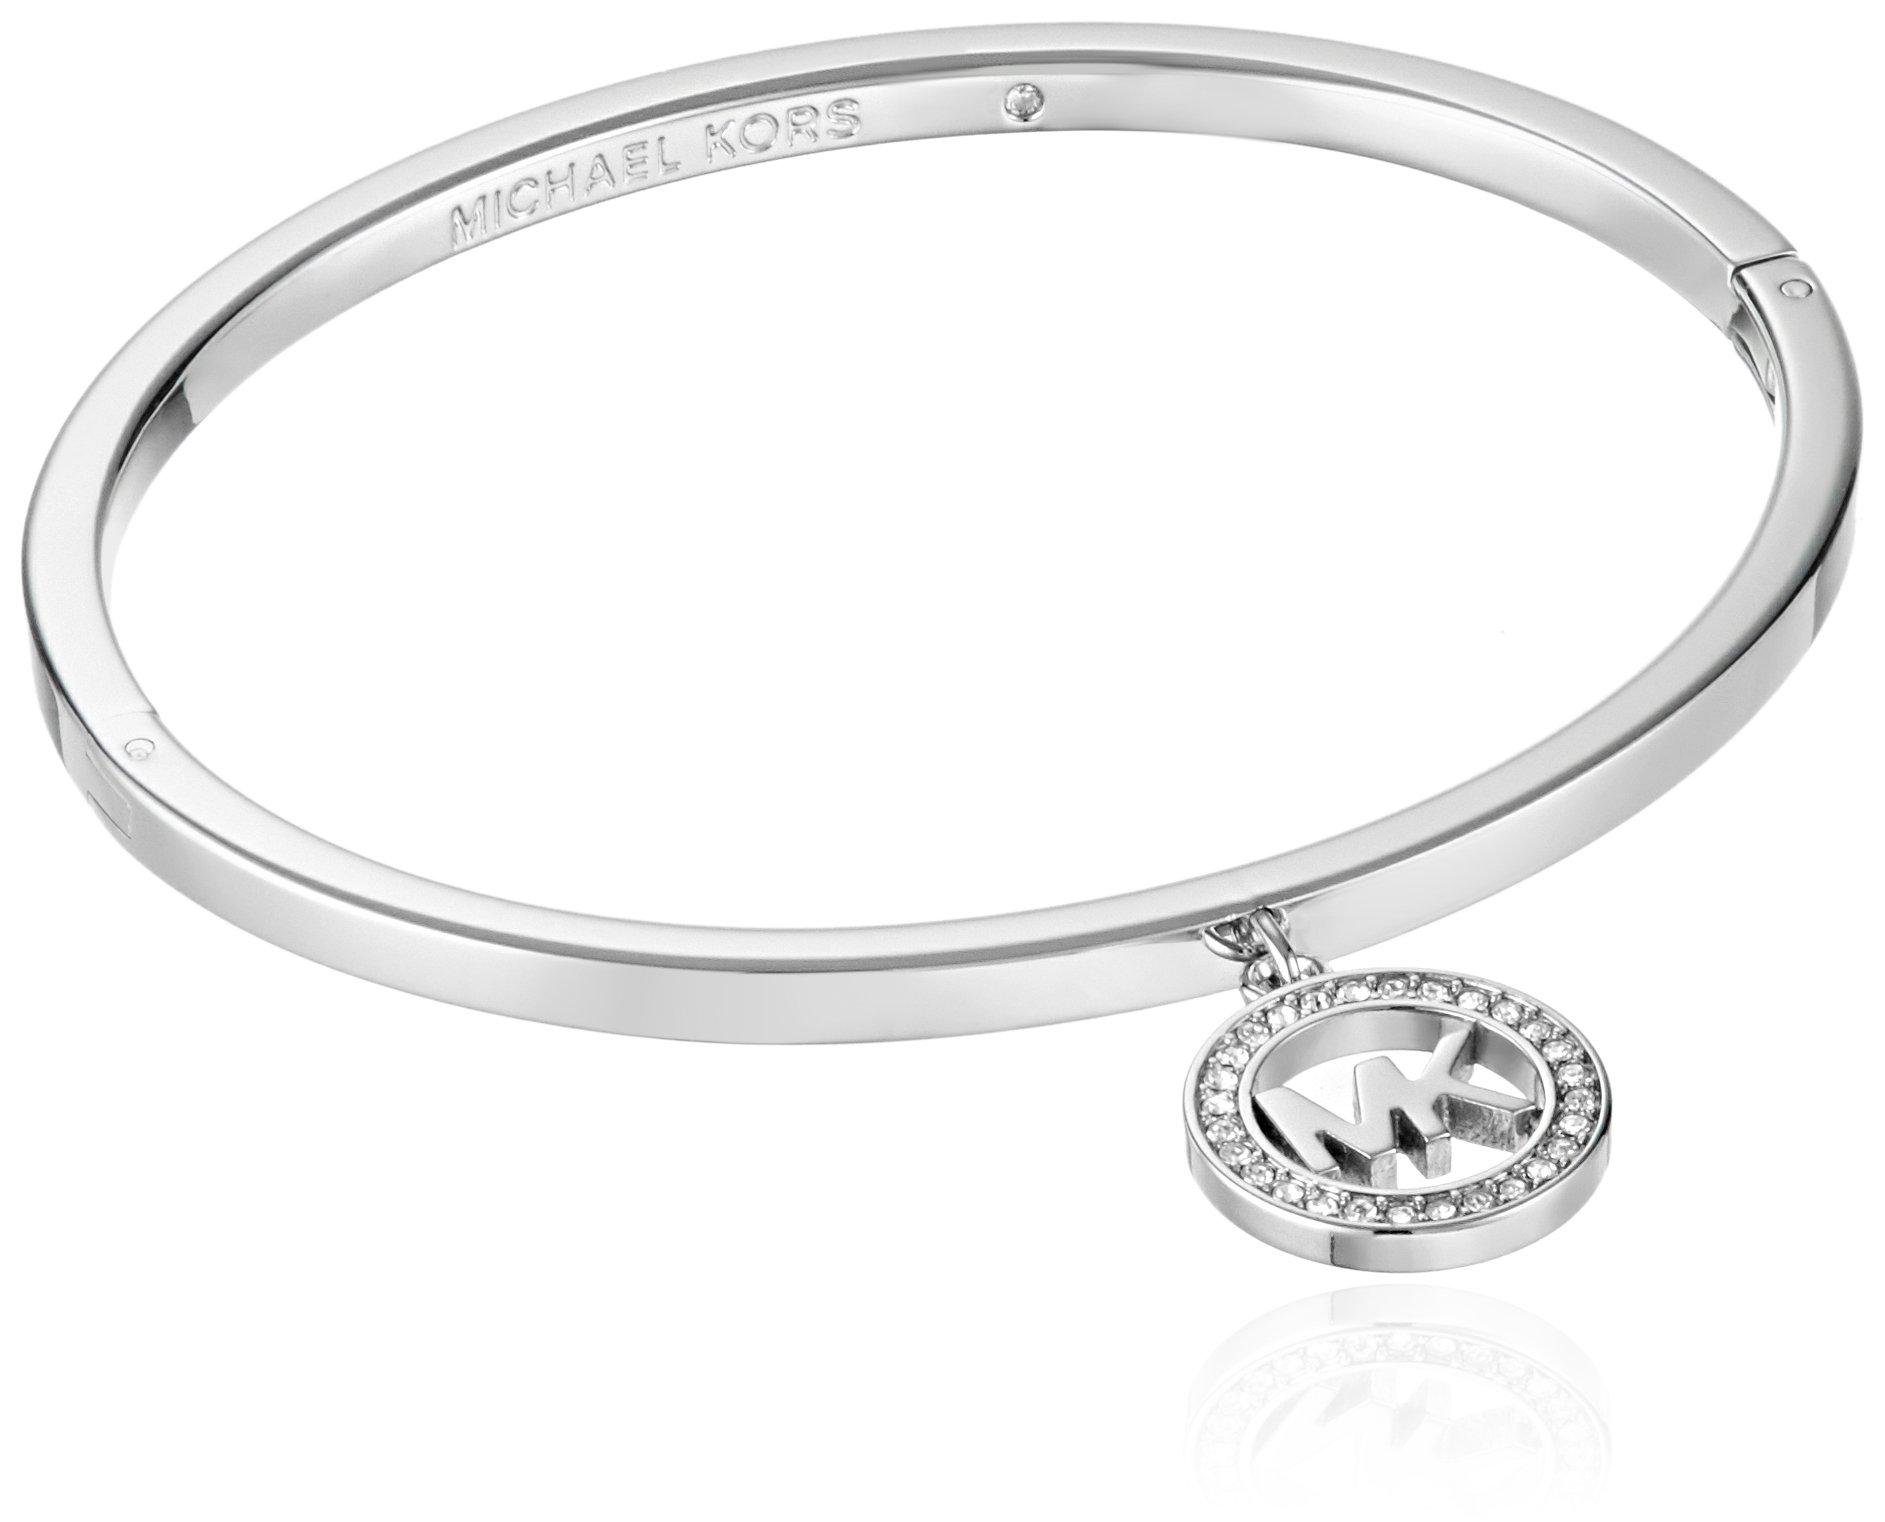 Michael Kors Silver Jewelry Hinged Bangle Bracelet